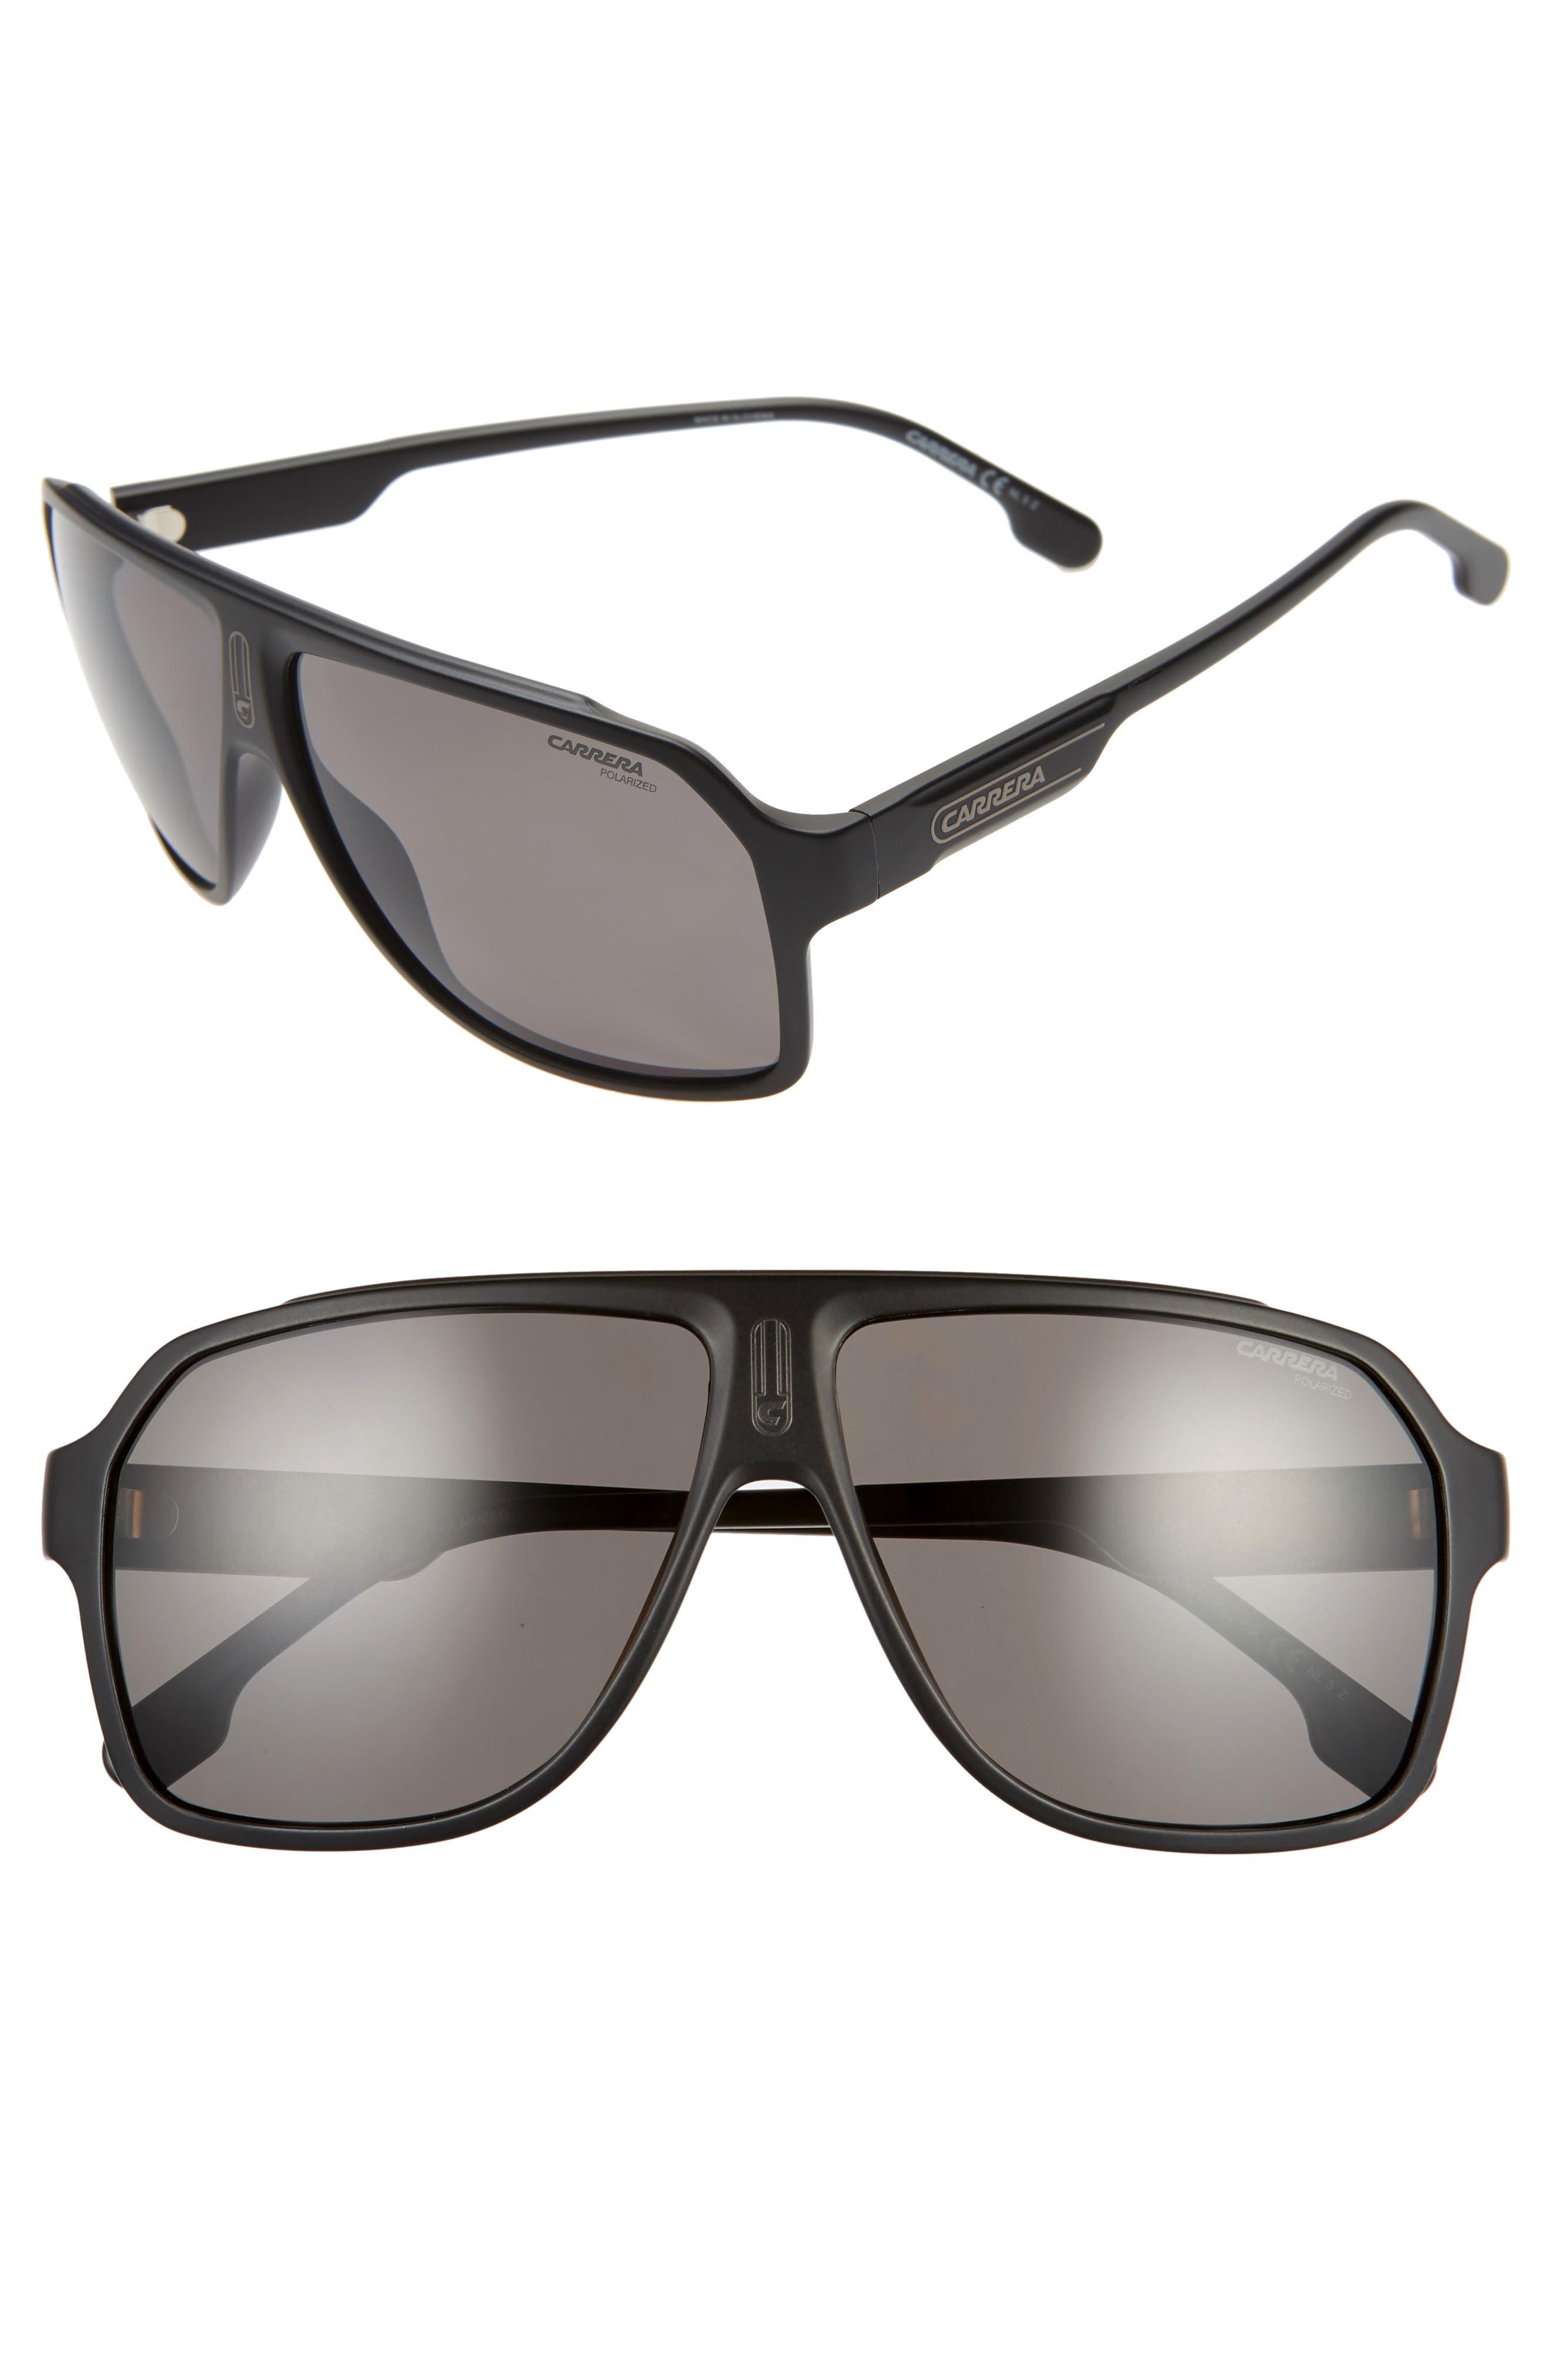 62mm Oversize Polarized Flat Top Aviator Sunglasses